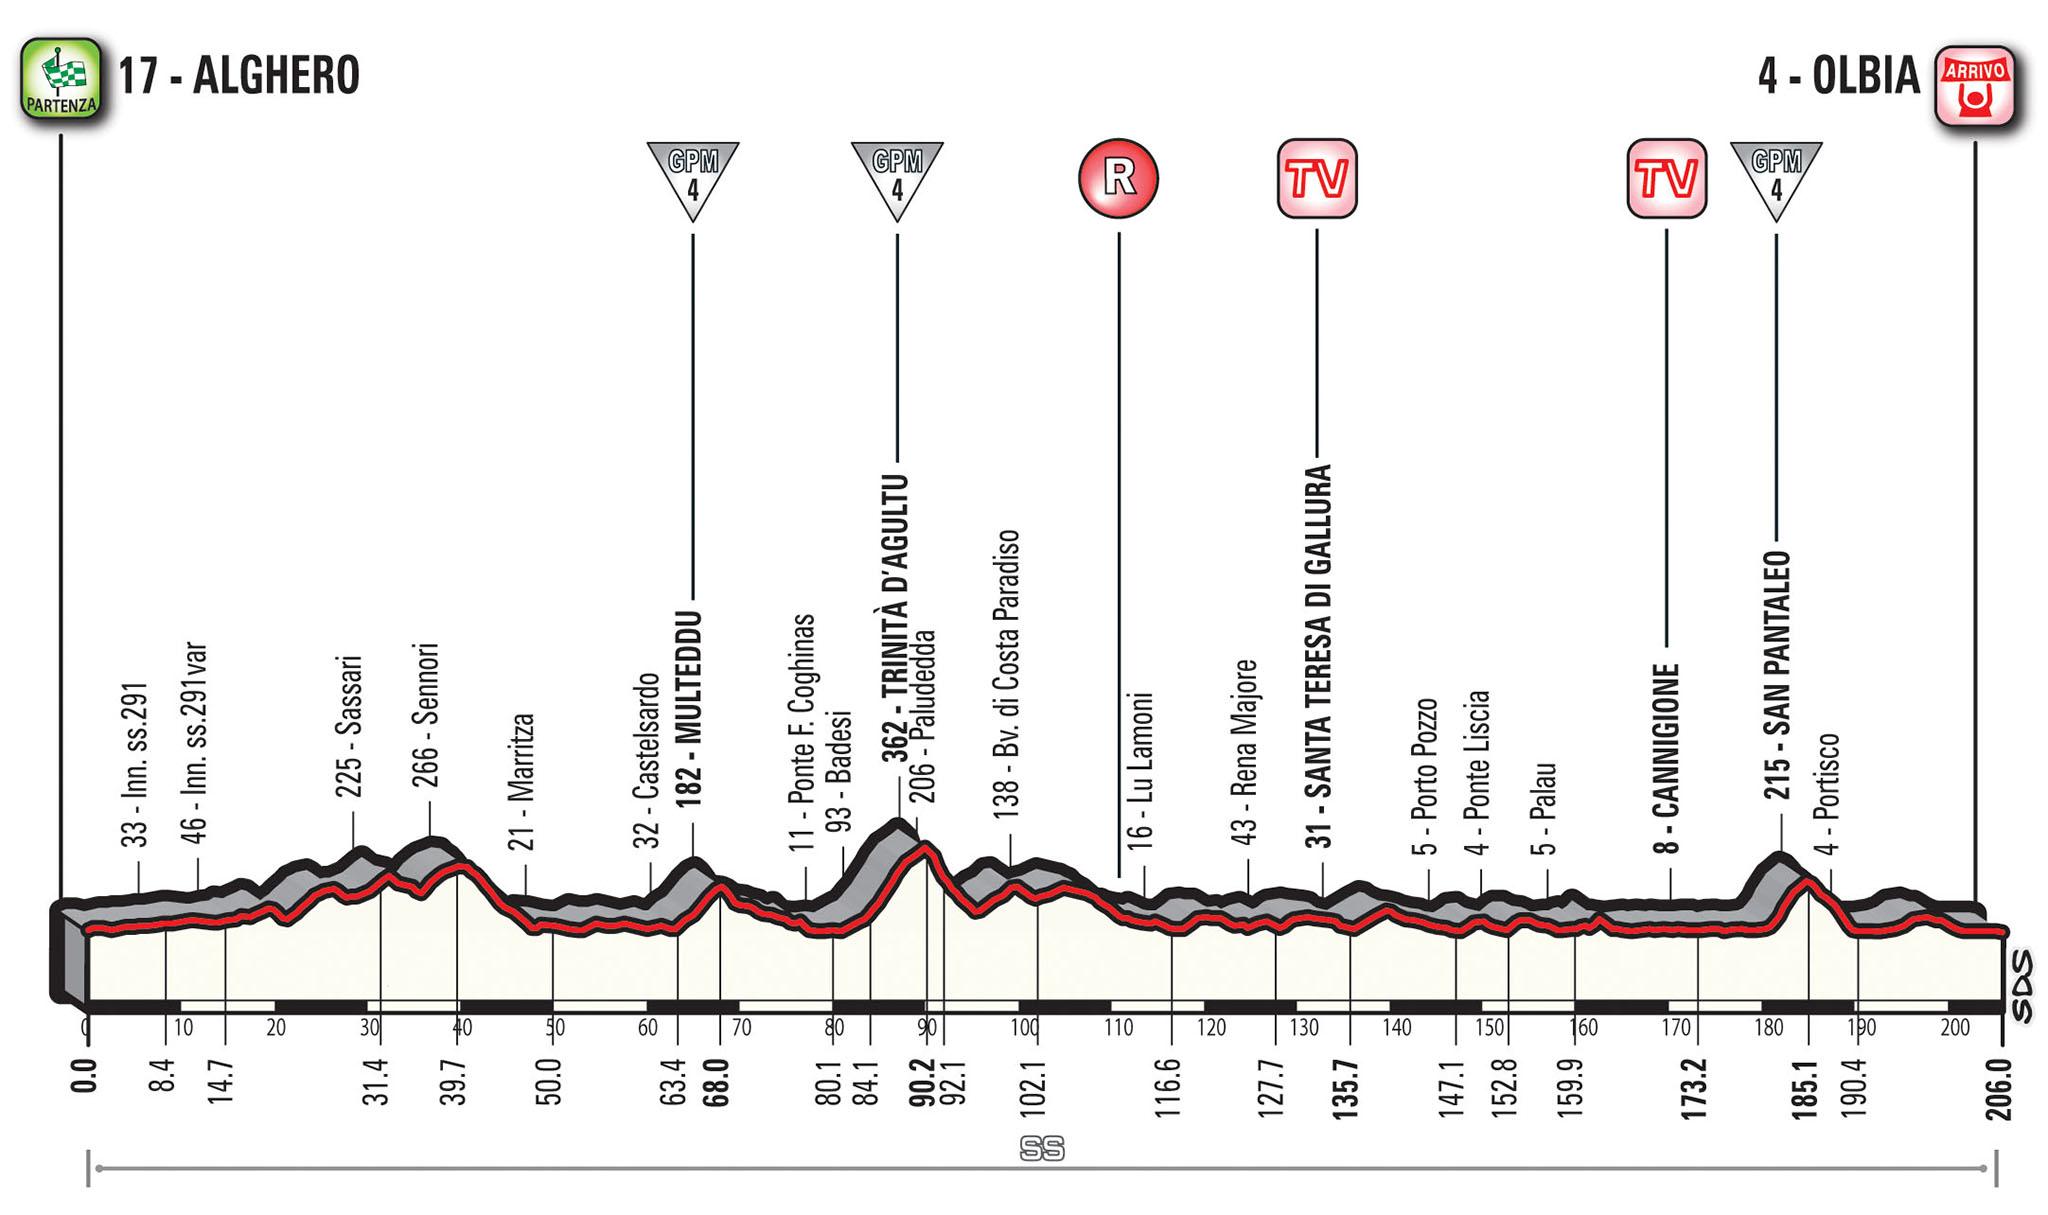 Giro d'Italia 2017: Prima Tappa Alghero-Olbia